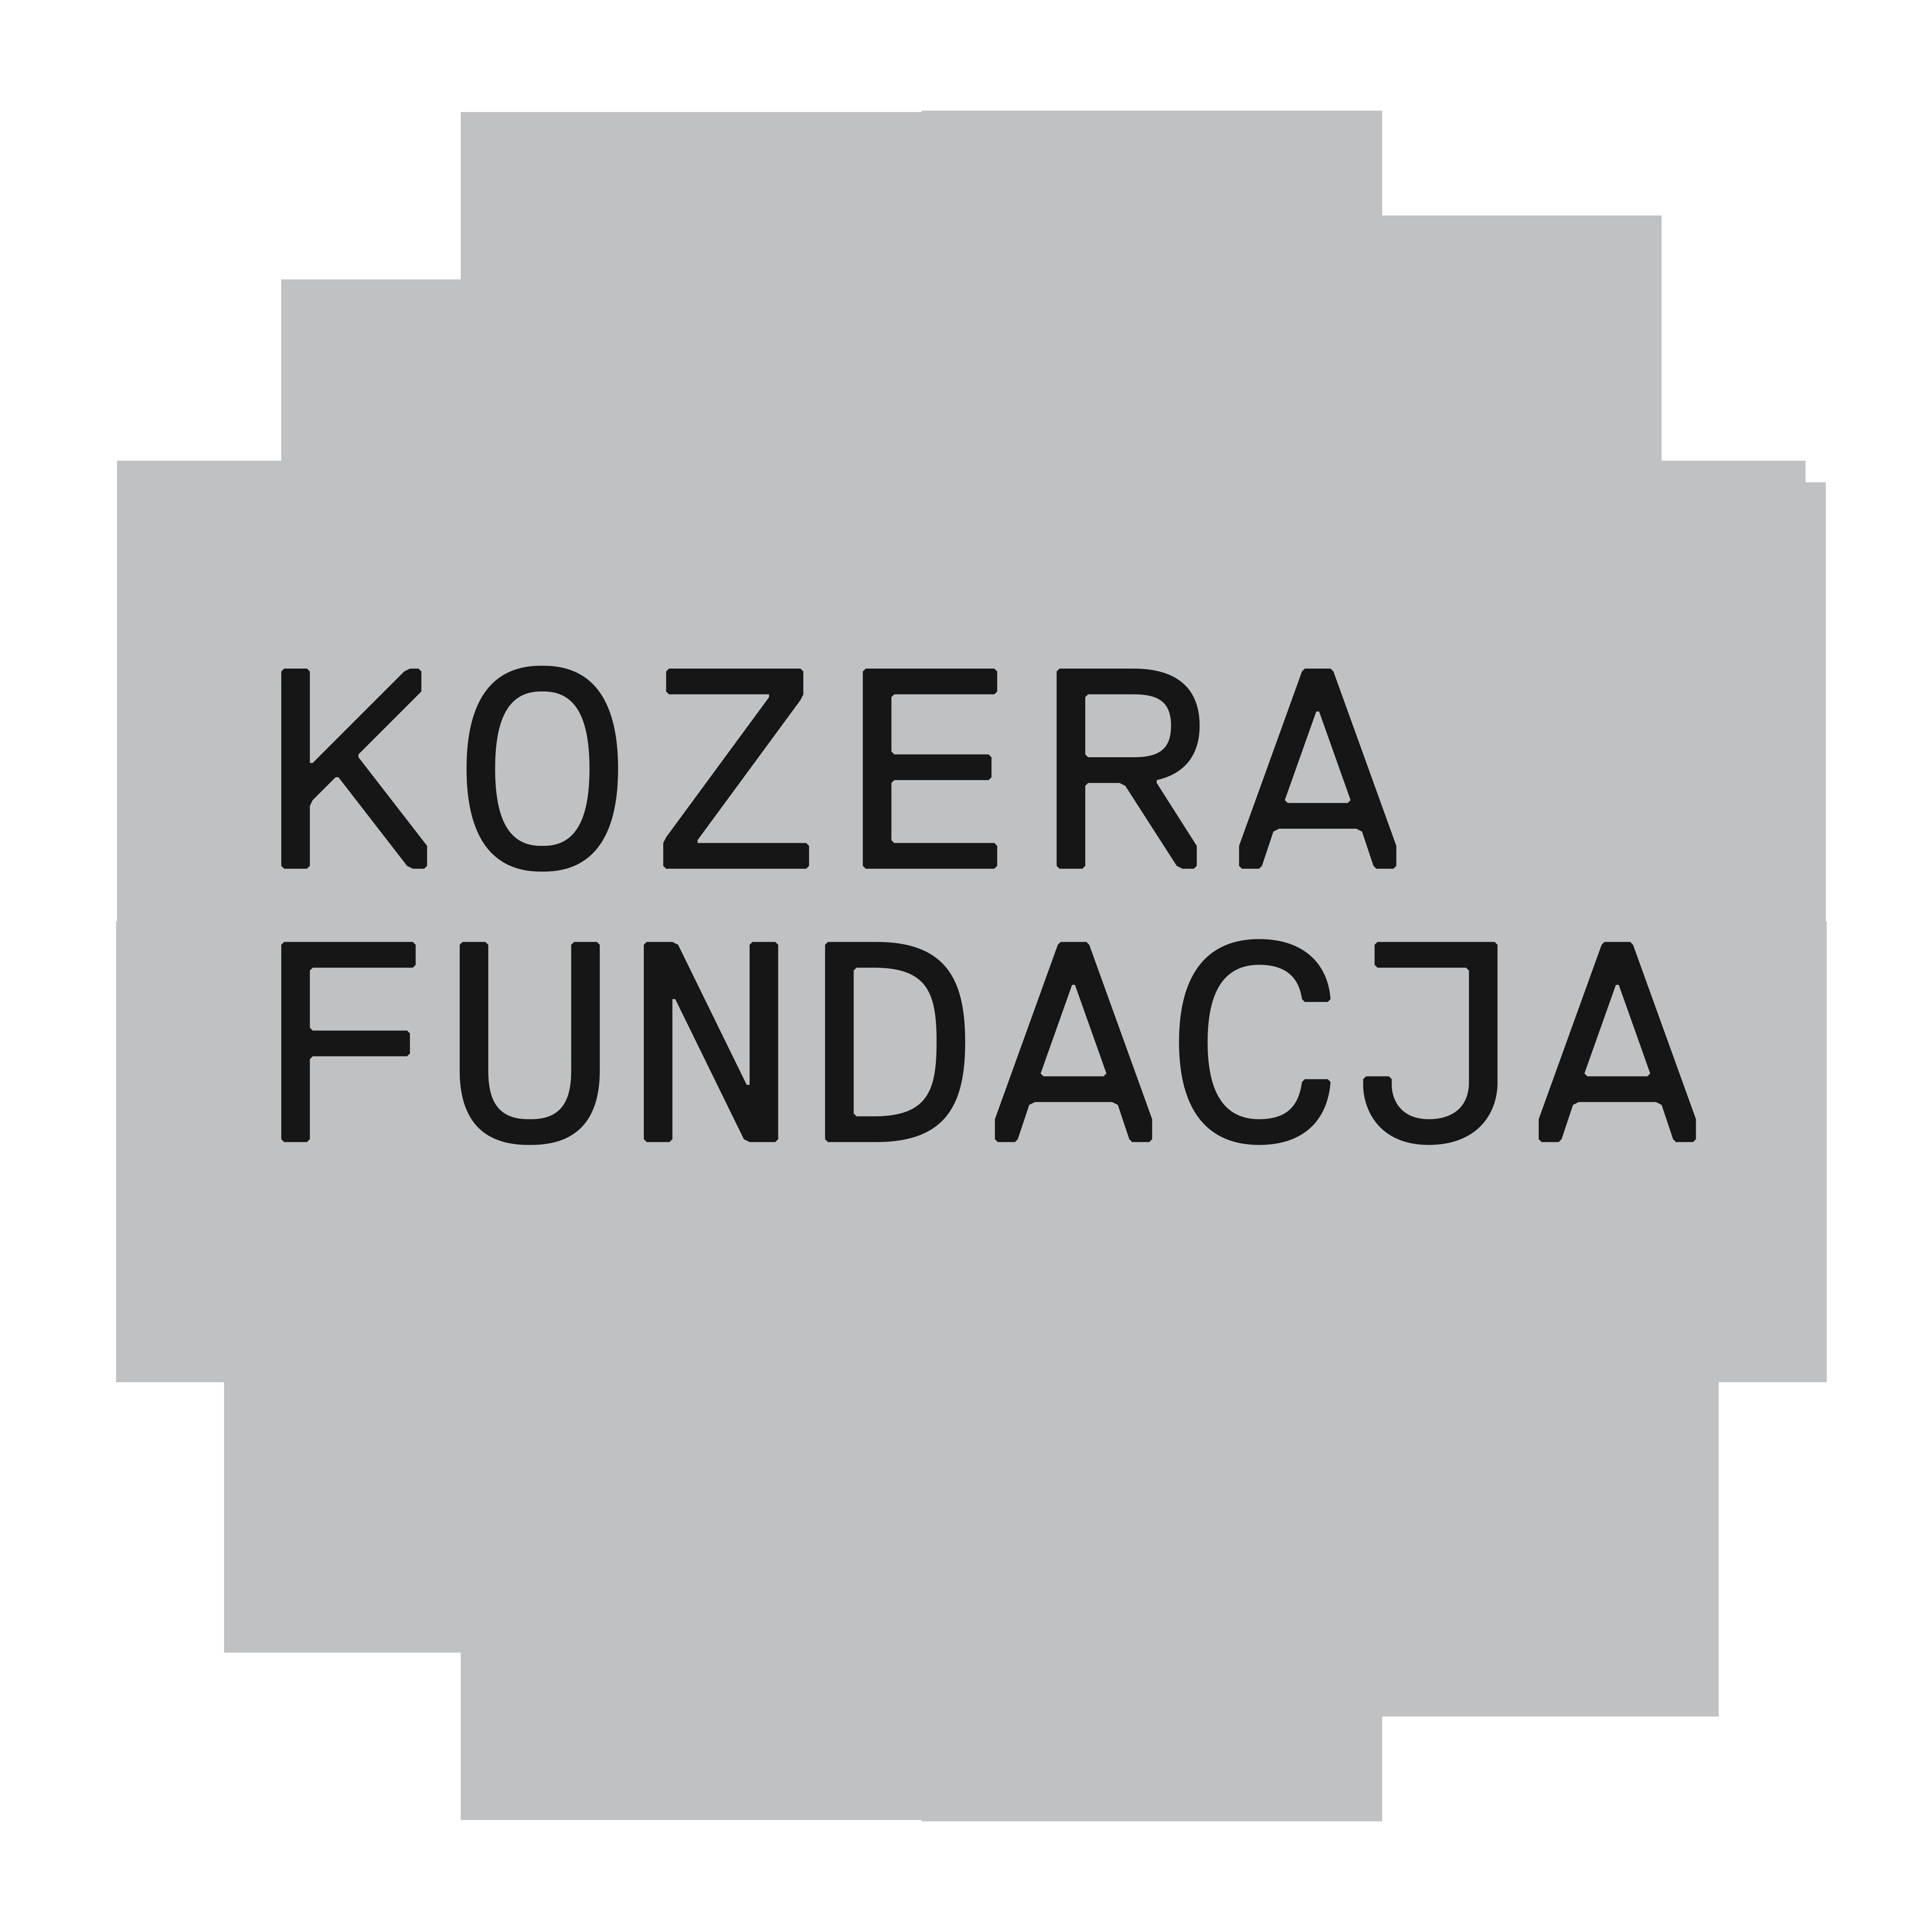 Logo Kozera Fundacja